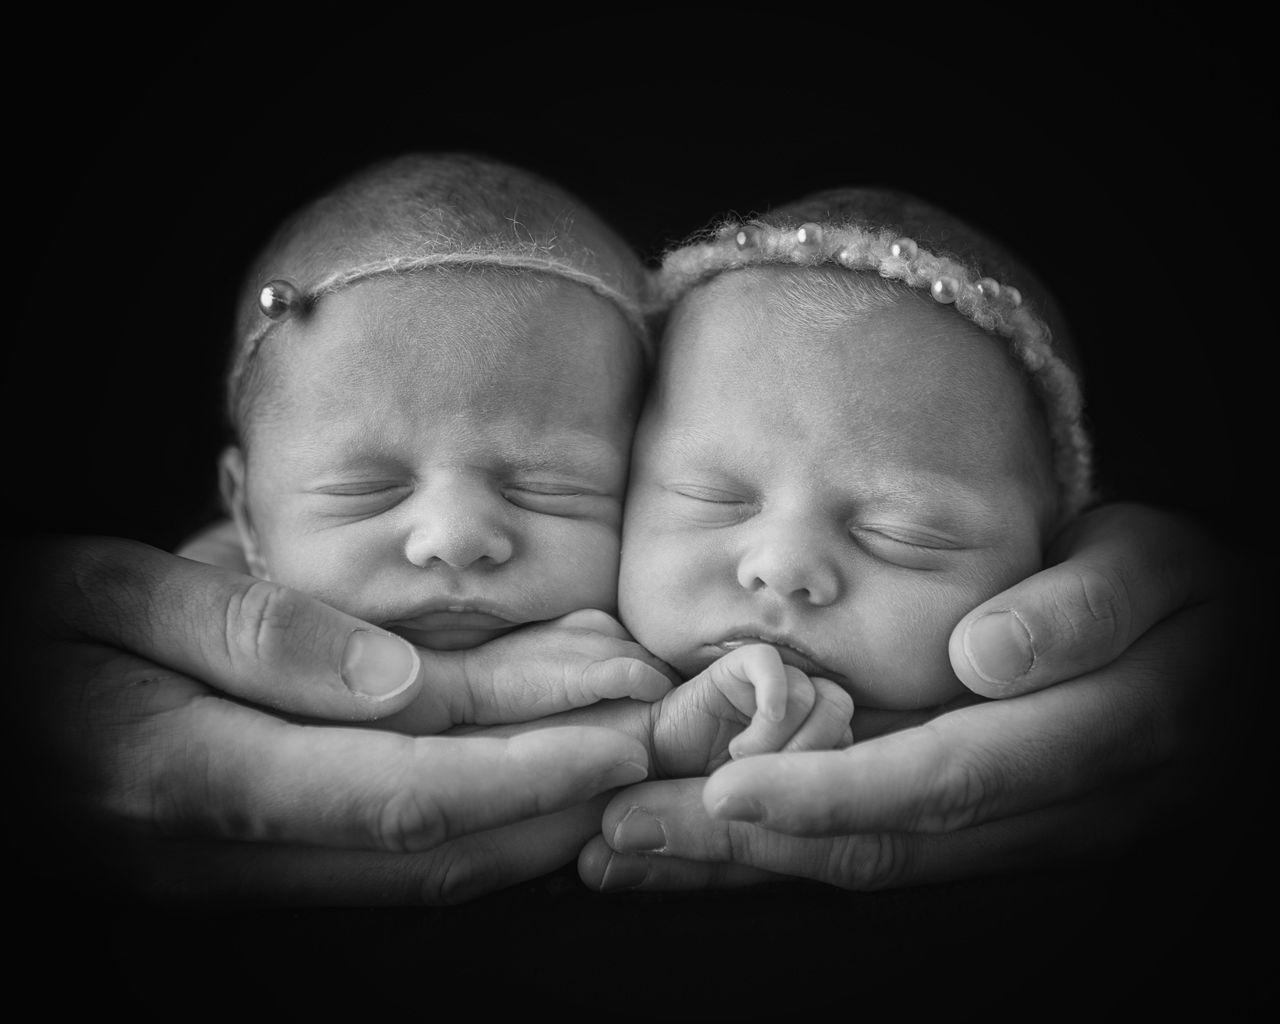 cute baby photo of twin girls